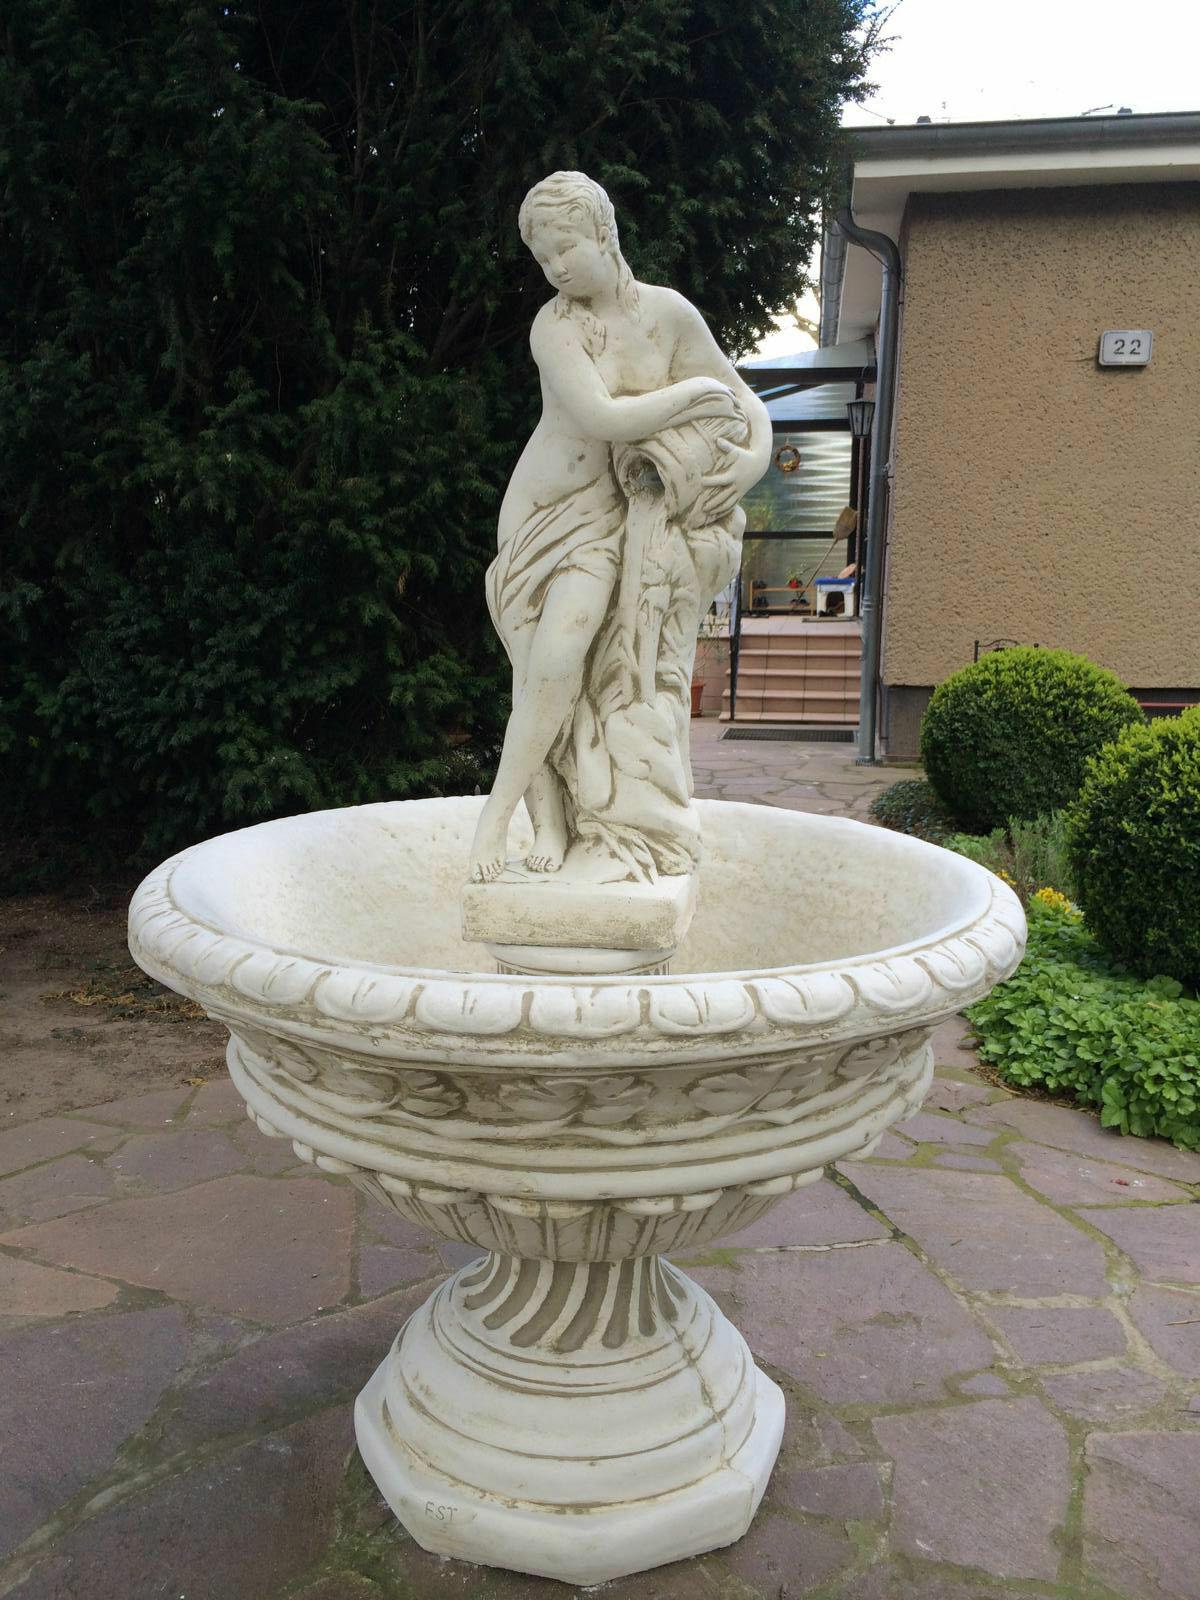 Garten Brunnen Zierbrunnen Wasserspiel Steinbrunnen Springbrunnen Kaskade NEU